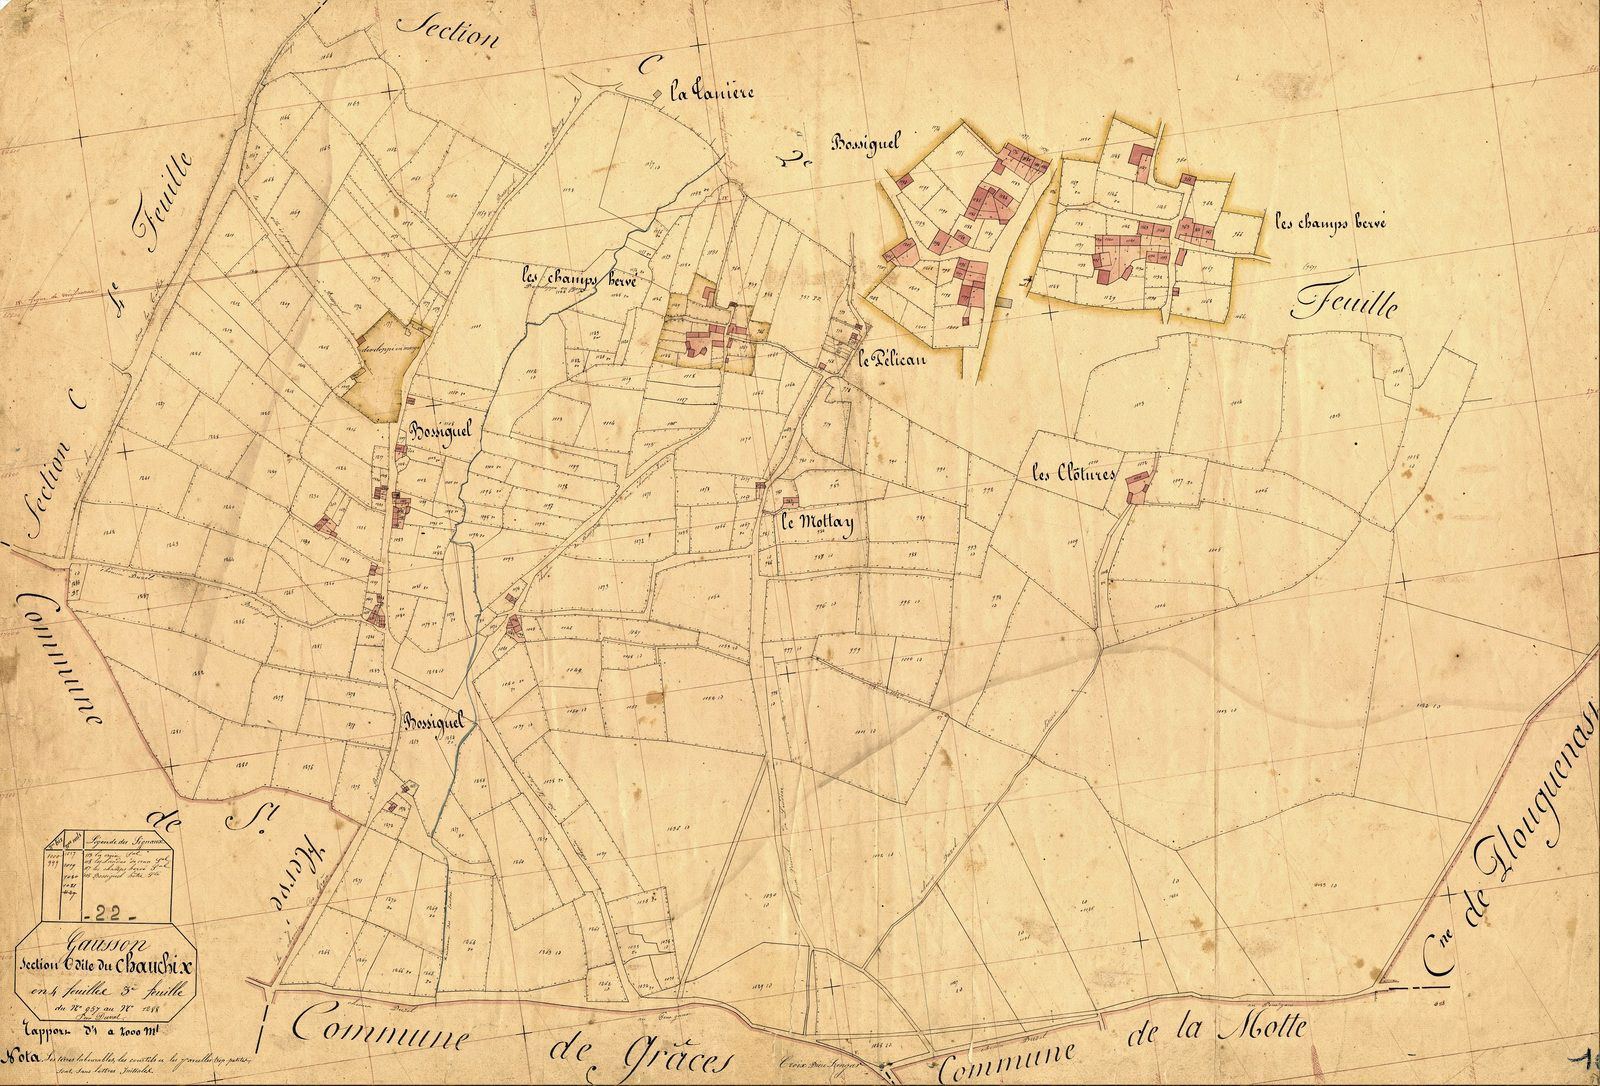 Gausson 1848 : Bossiguel